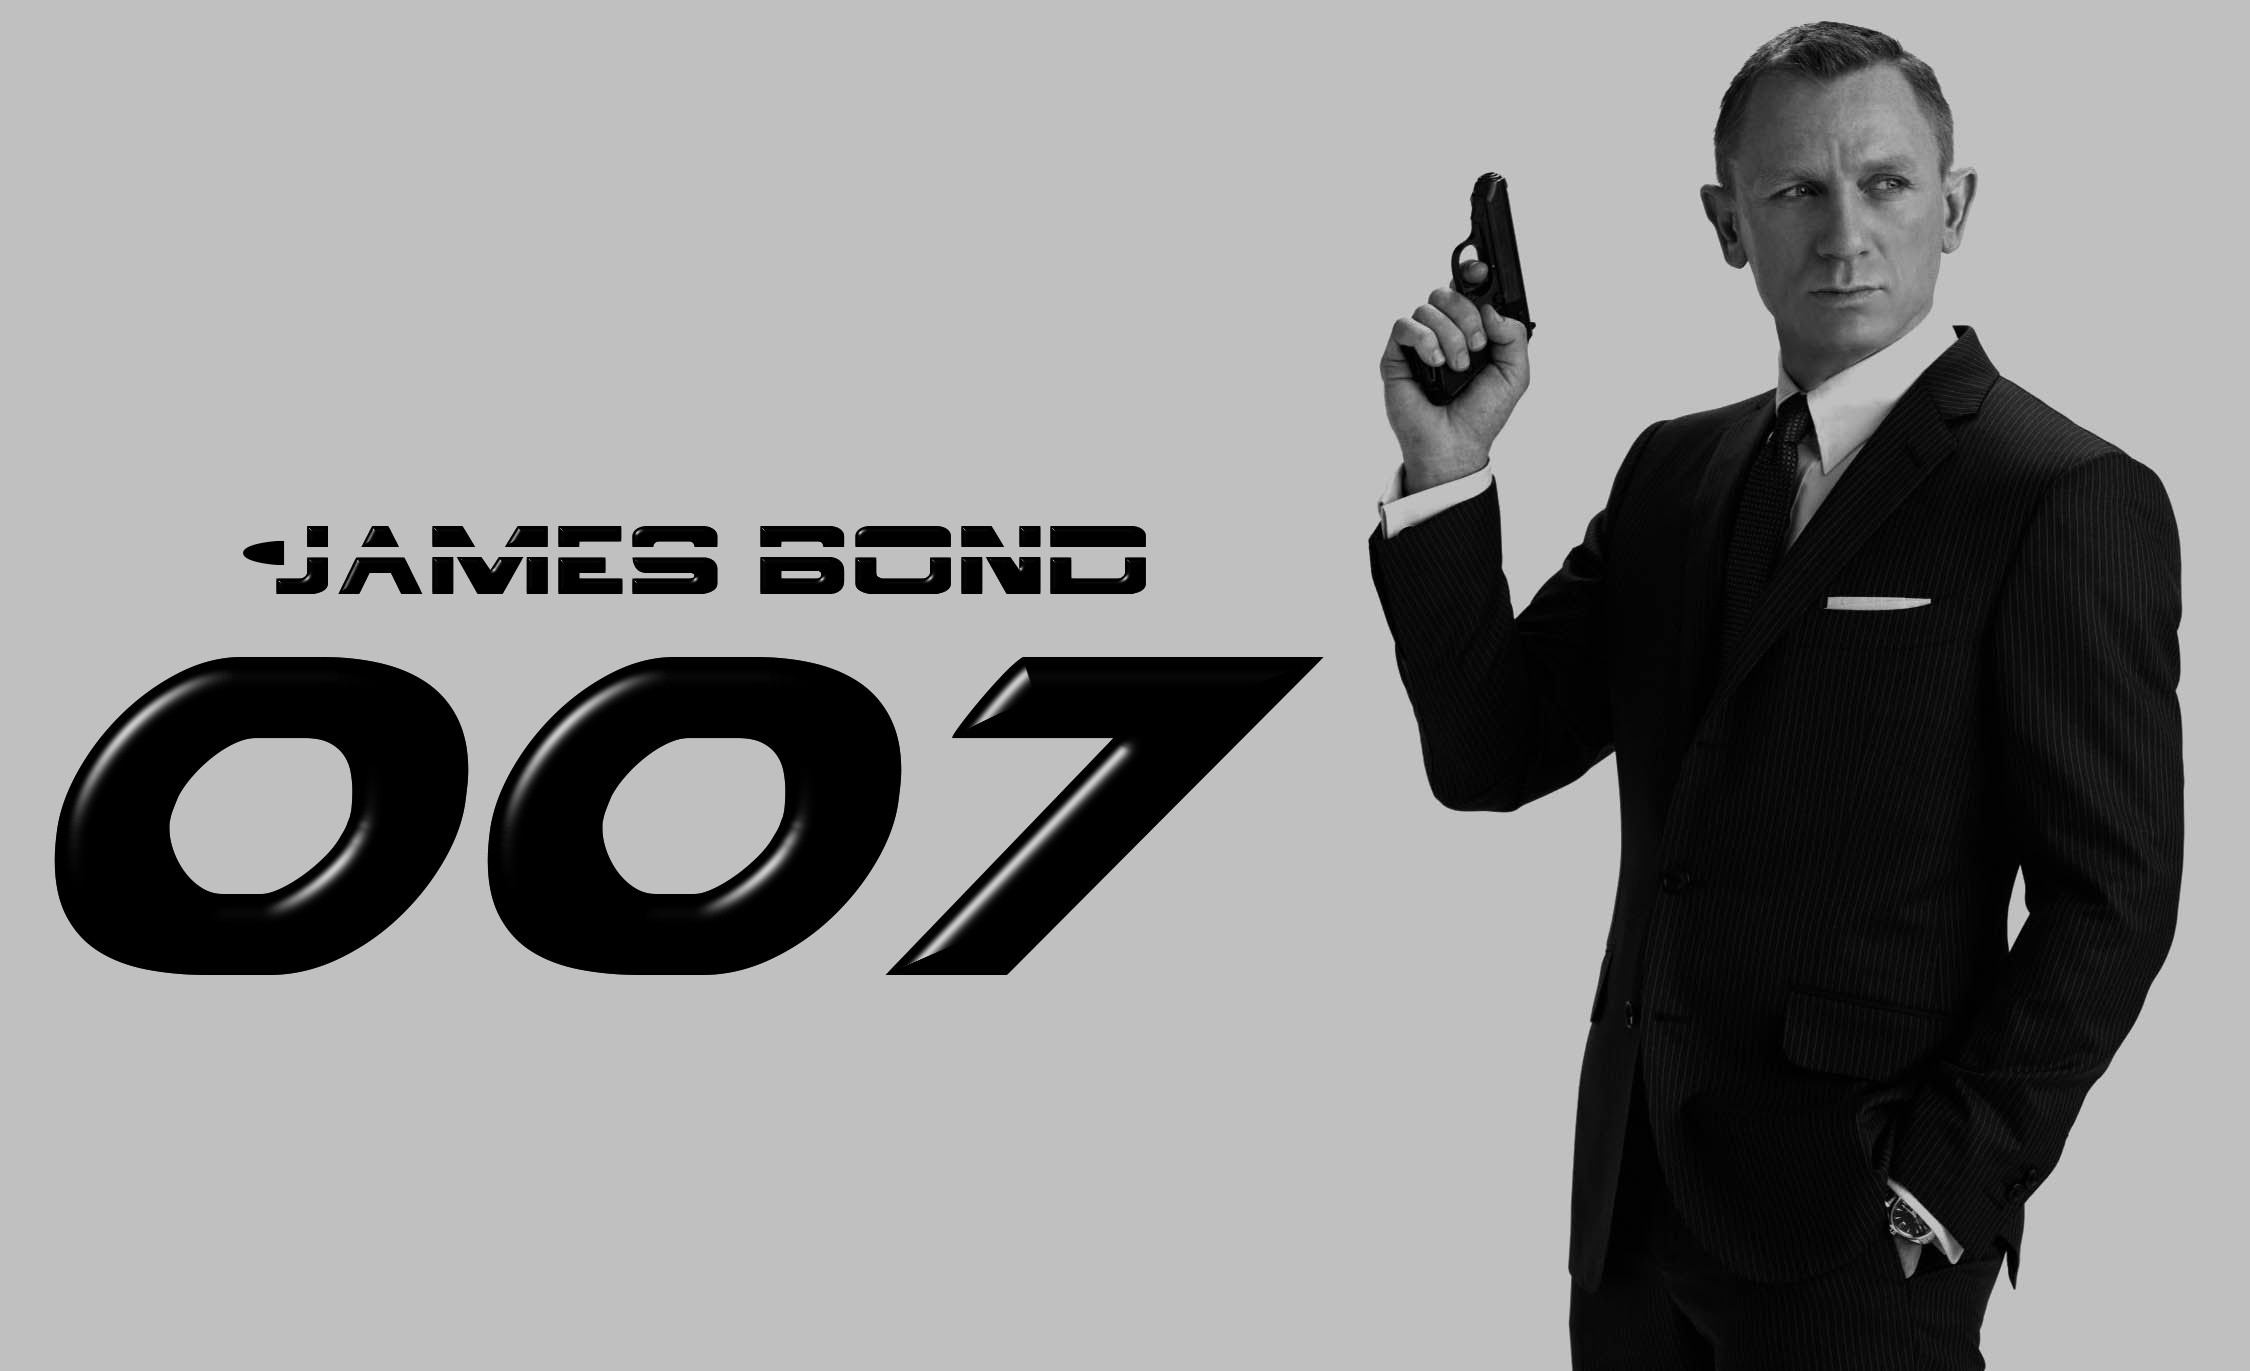 007 Logo Wallpaper (70+ Images